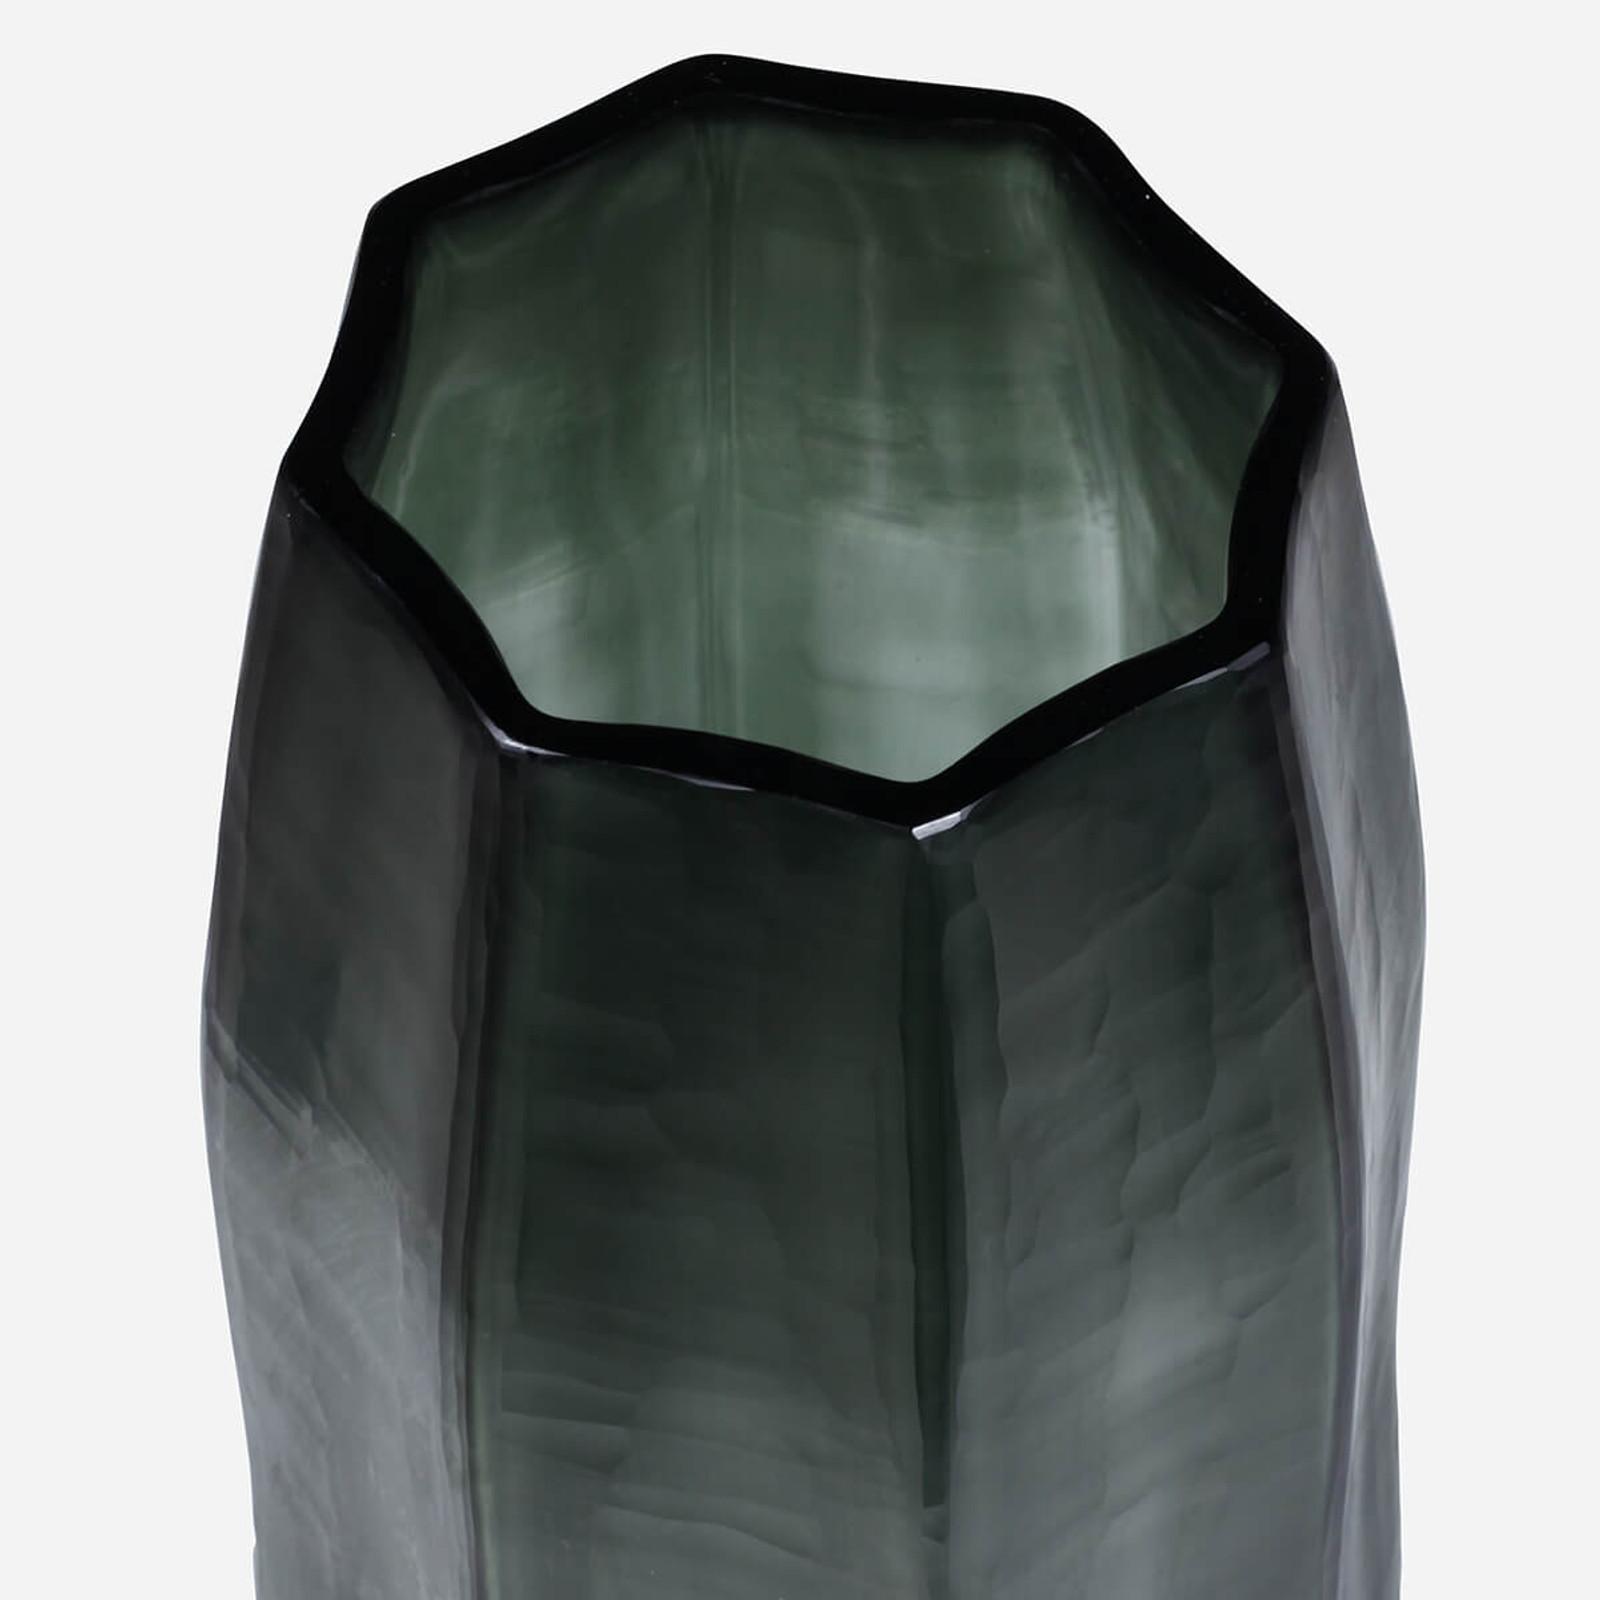 Loire Tall Vase, Light Steel